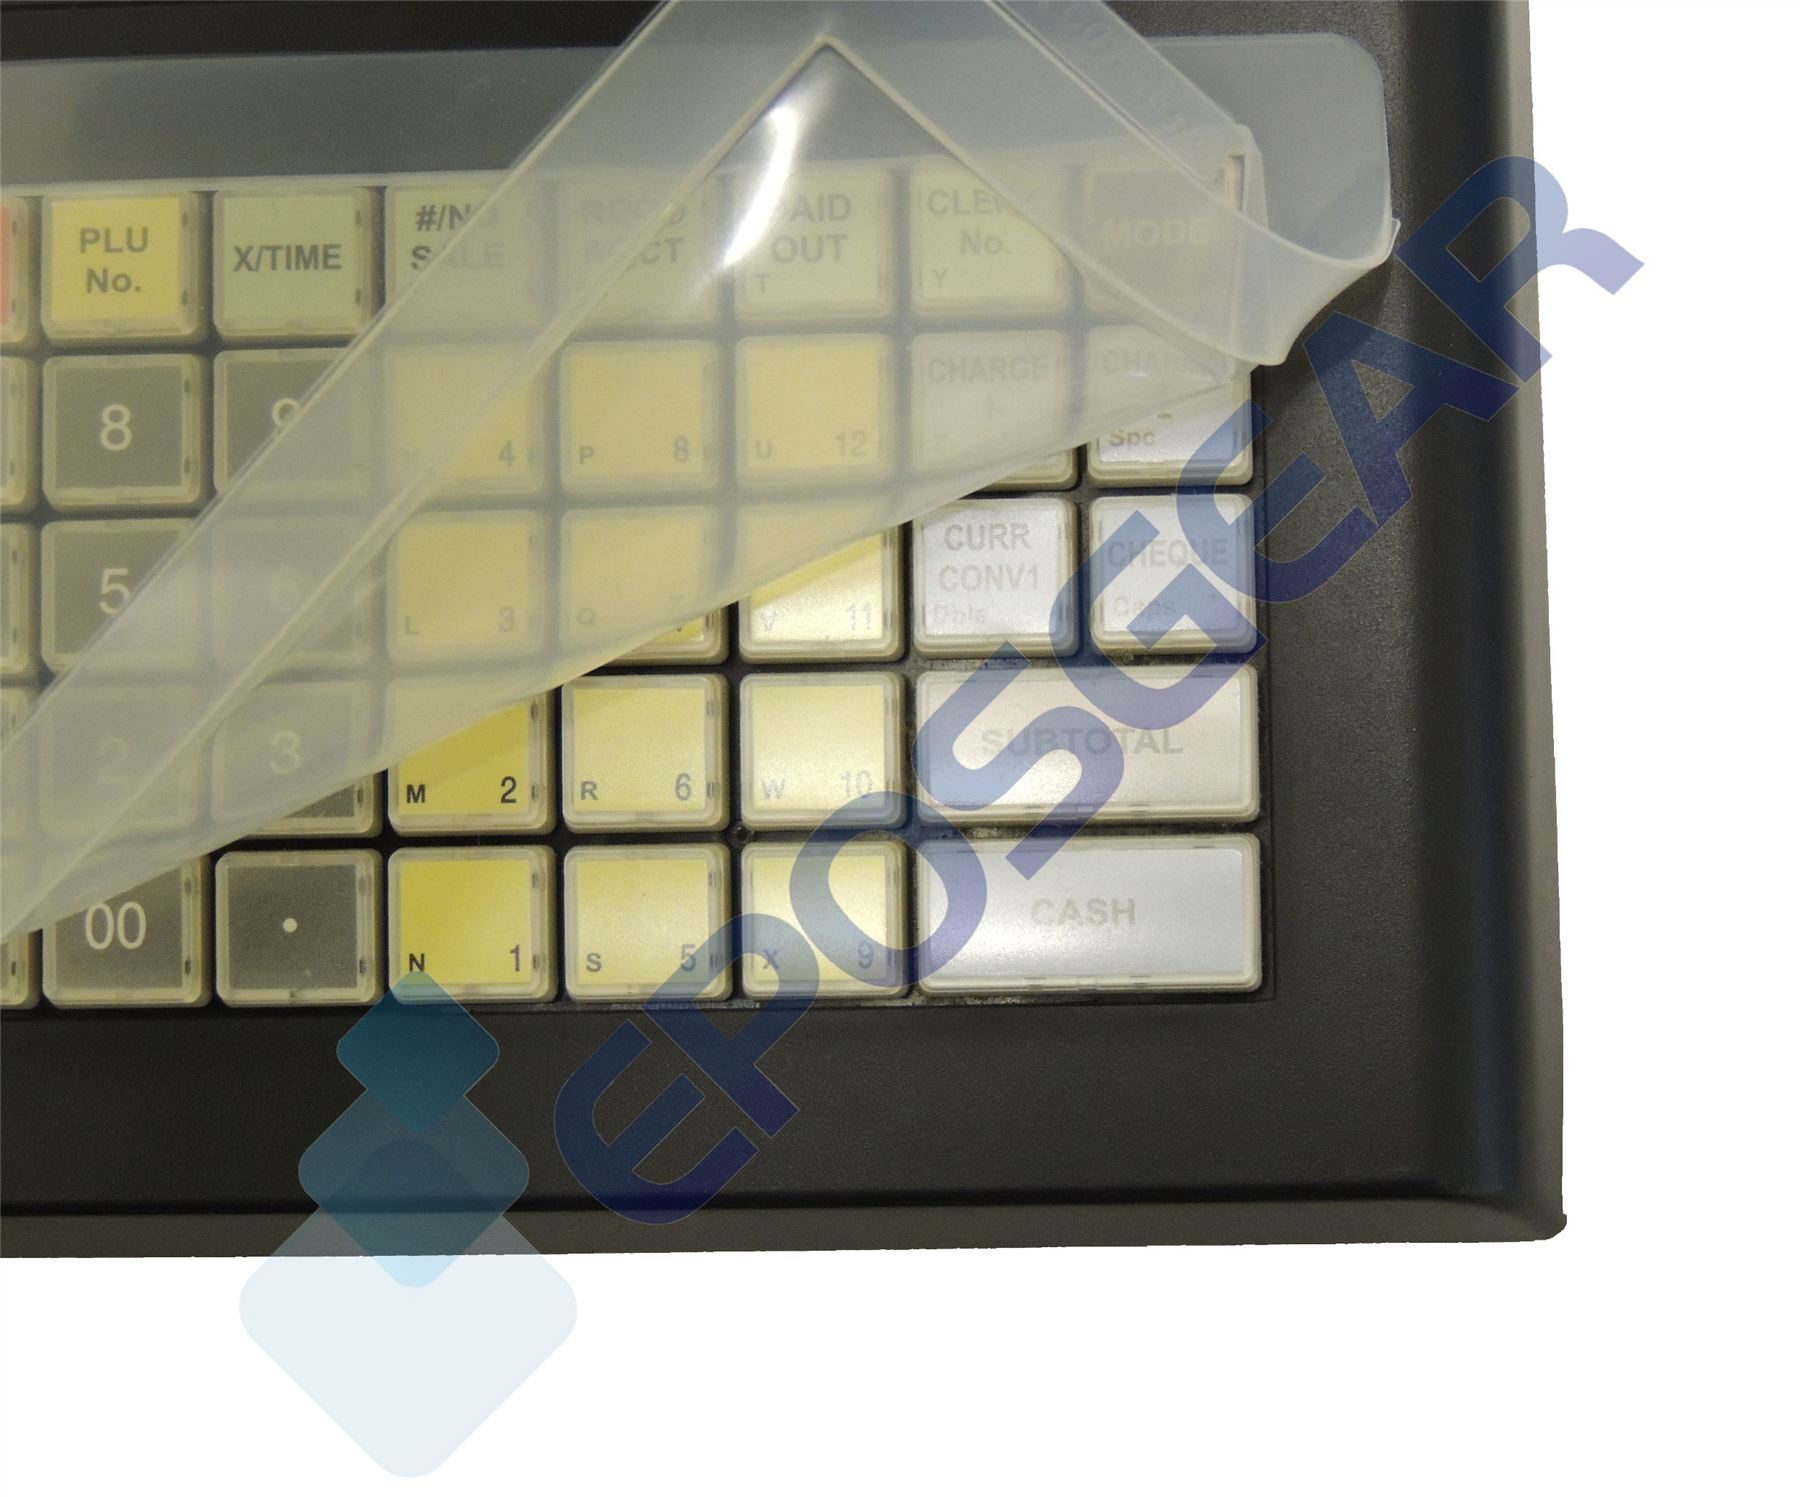 Cherry micro switch tastatore 1xum Set con 5 pezzi 1317a